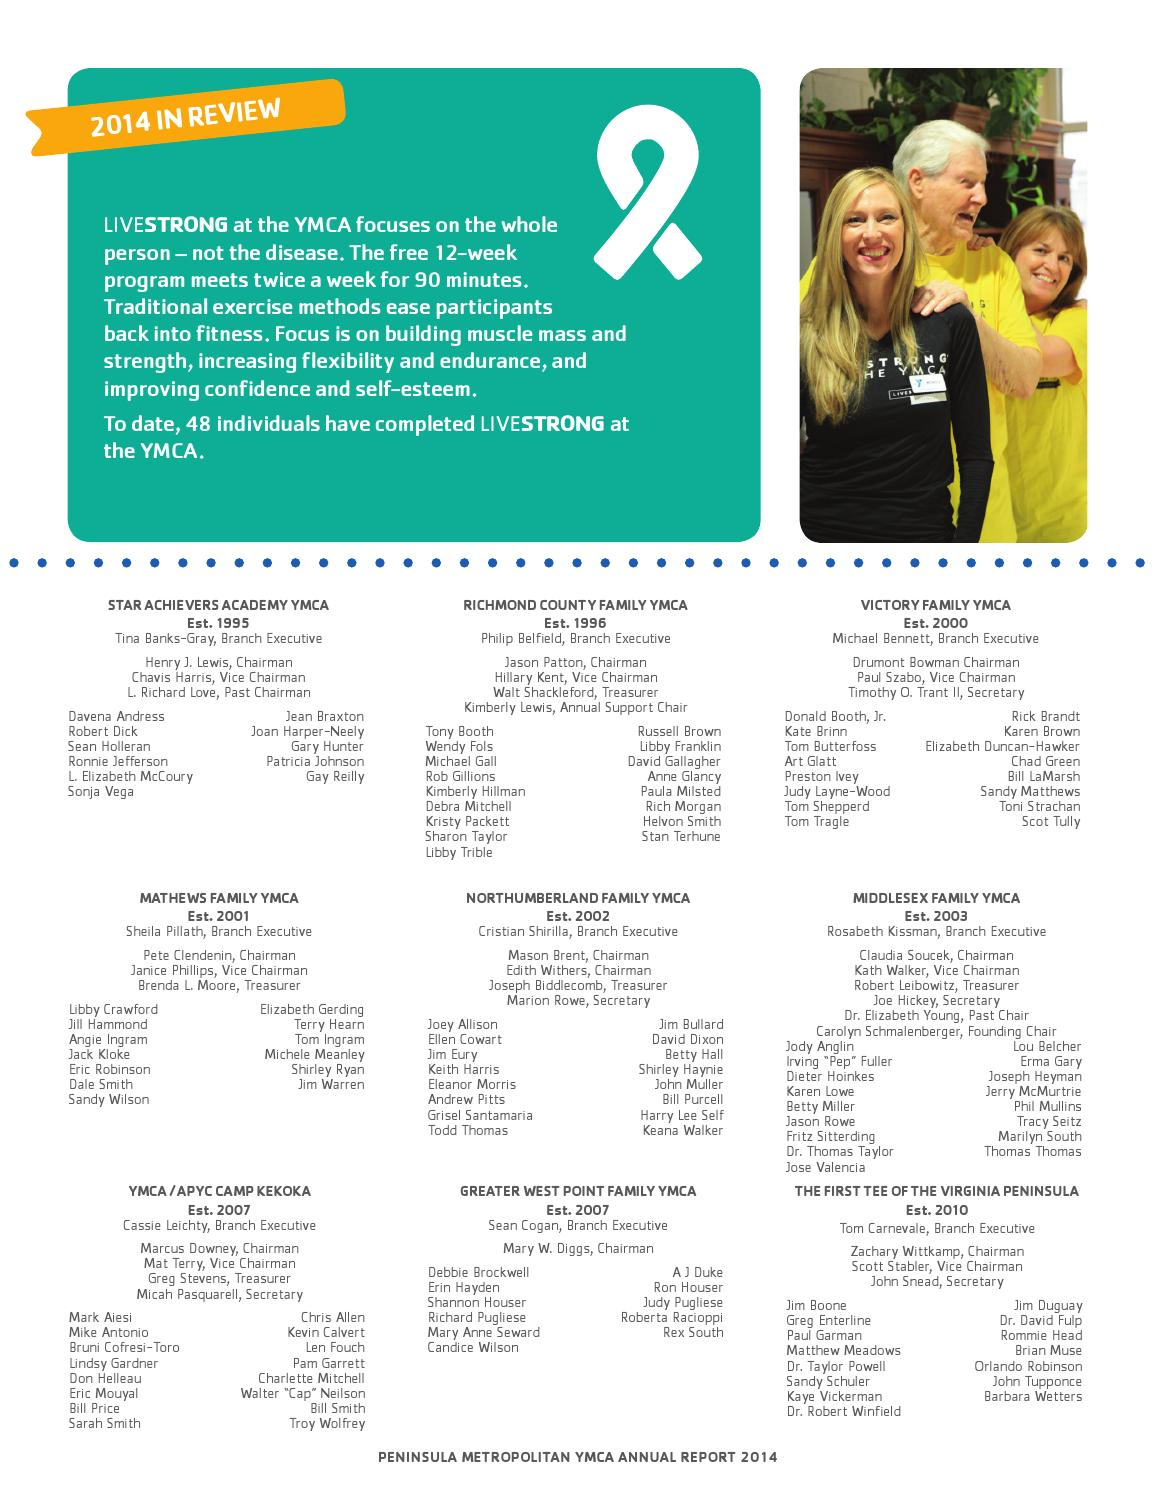 2014 Peninsula YMCA Annual Report by Peninsula Metropolitan